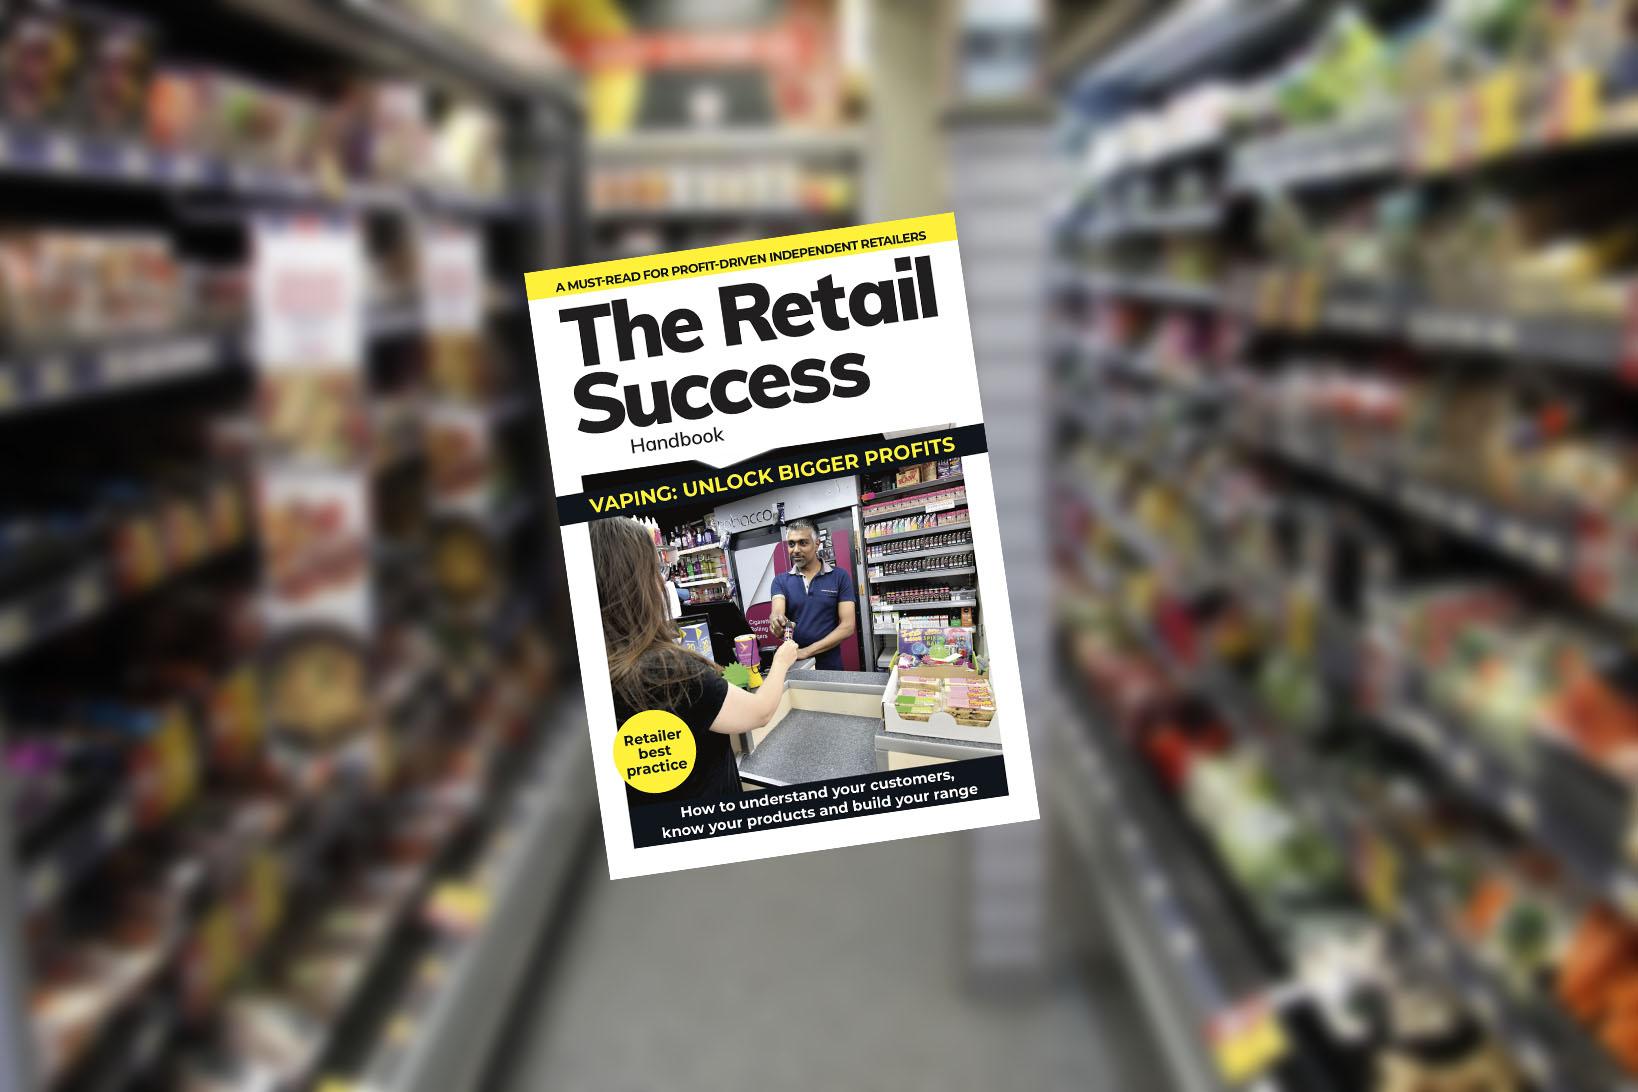 The Retail Success Handbook – Vaping - Unlock Bigger Profits